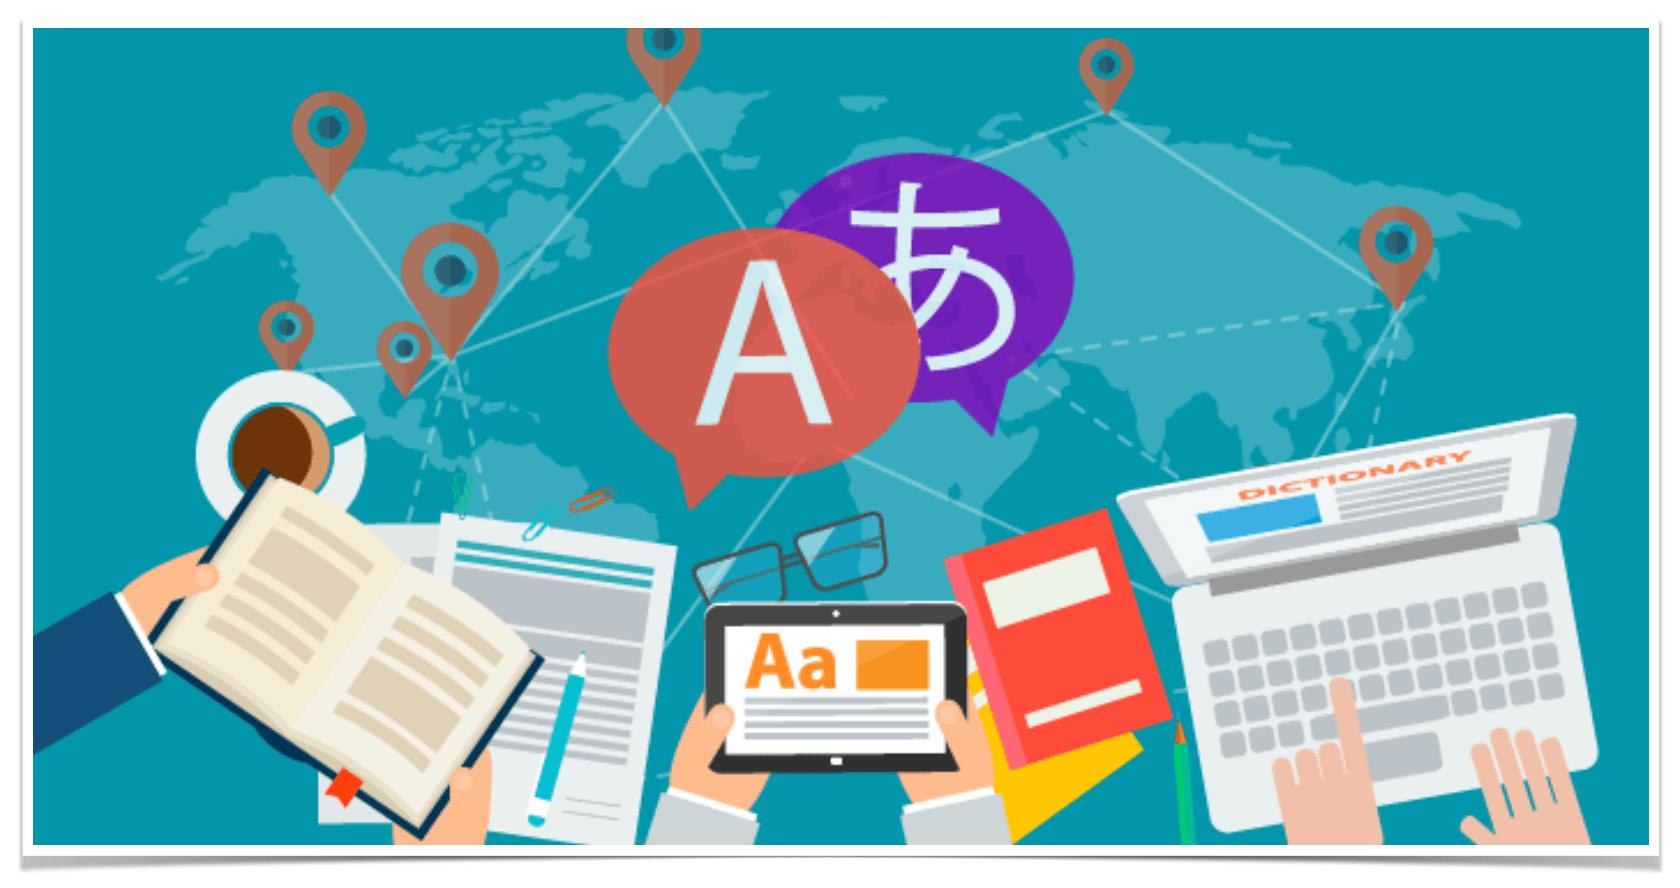 AFAR Cultural Communications Navigation